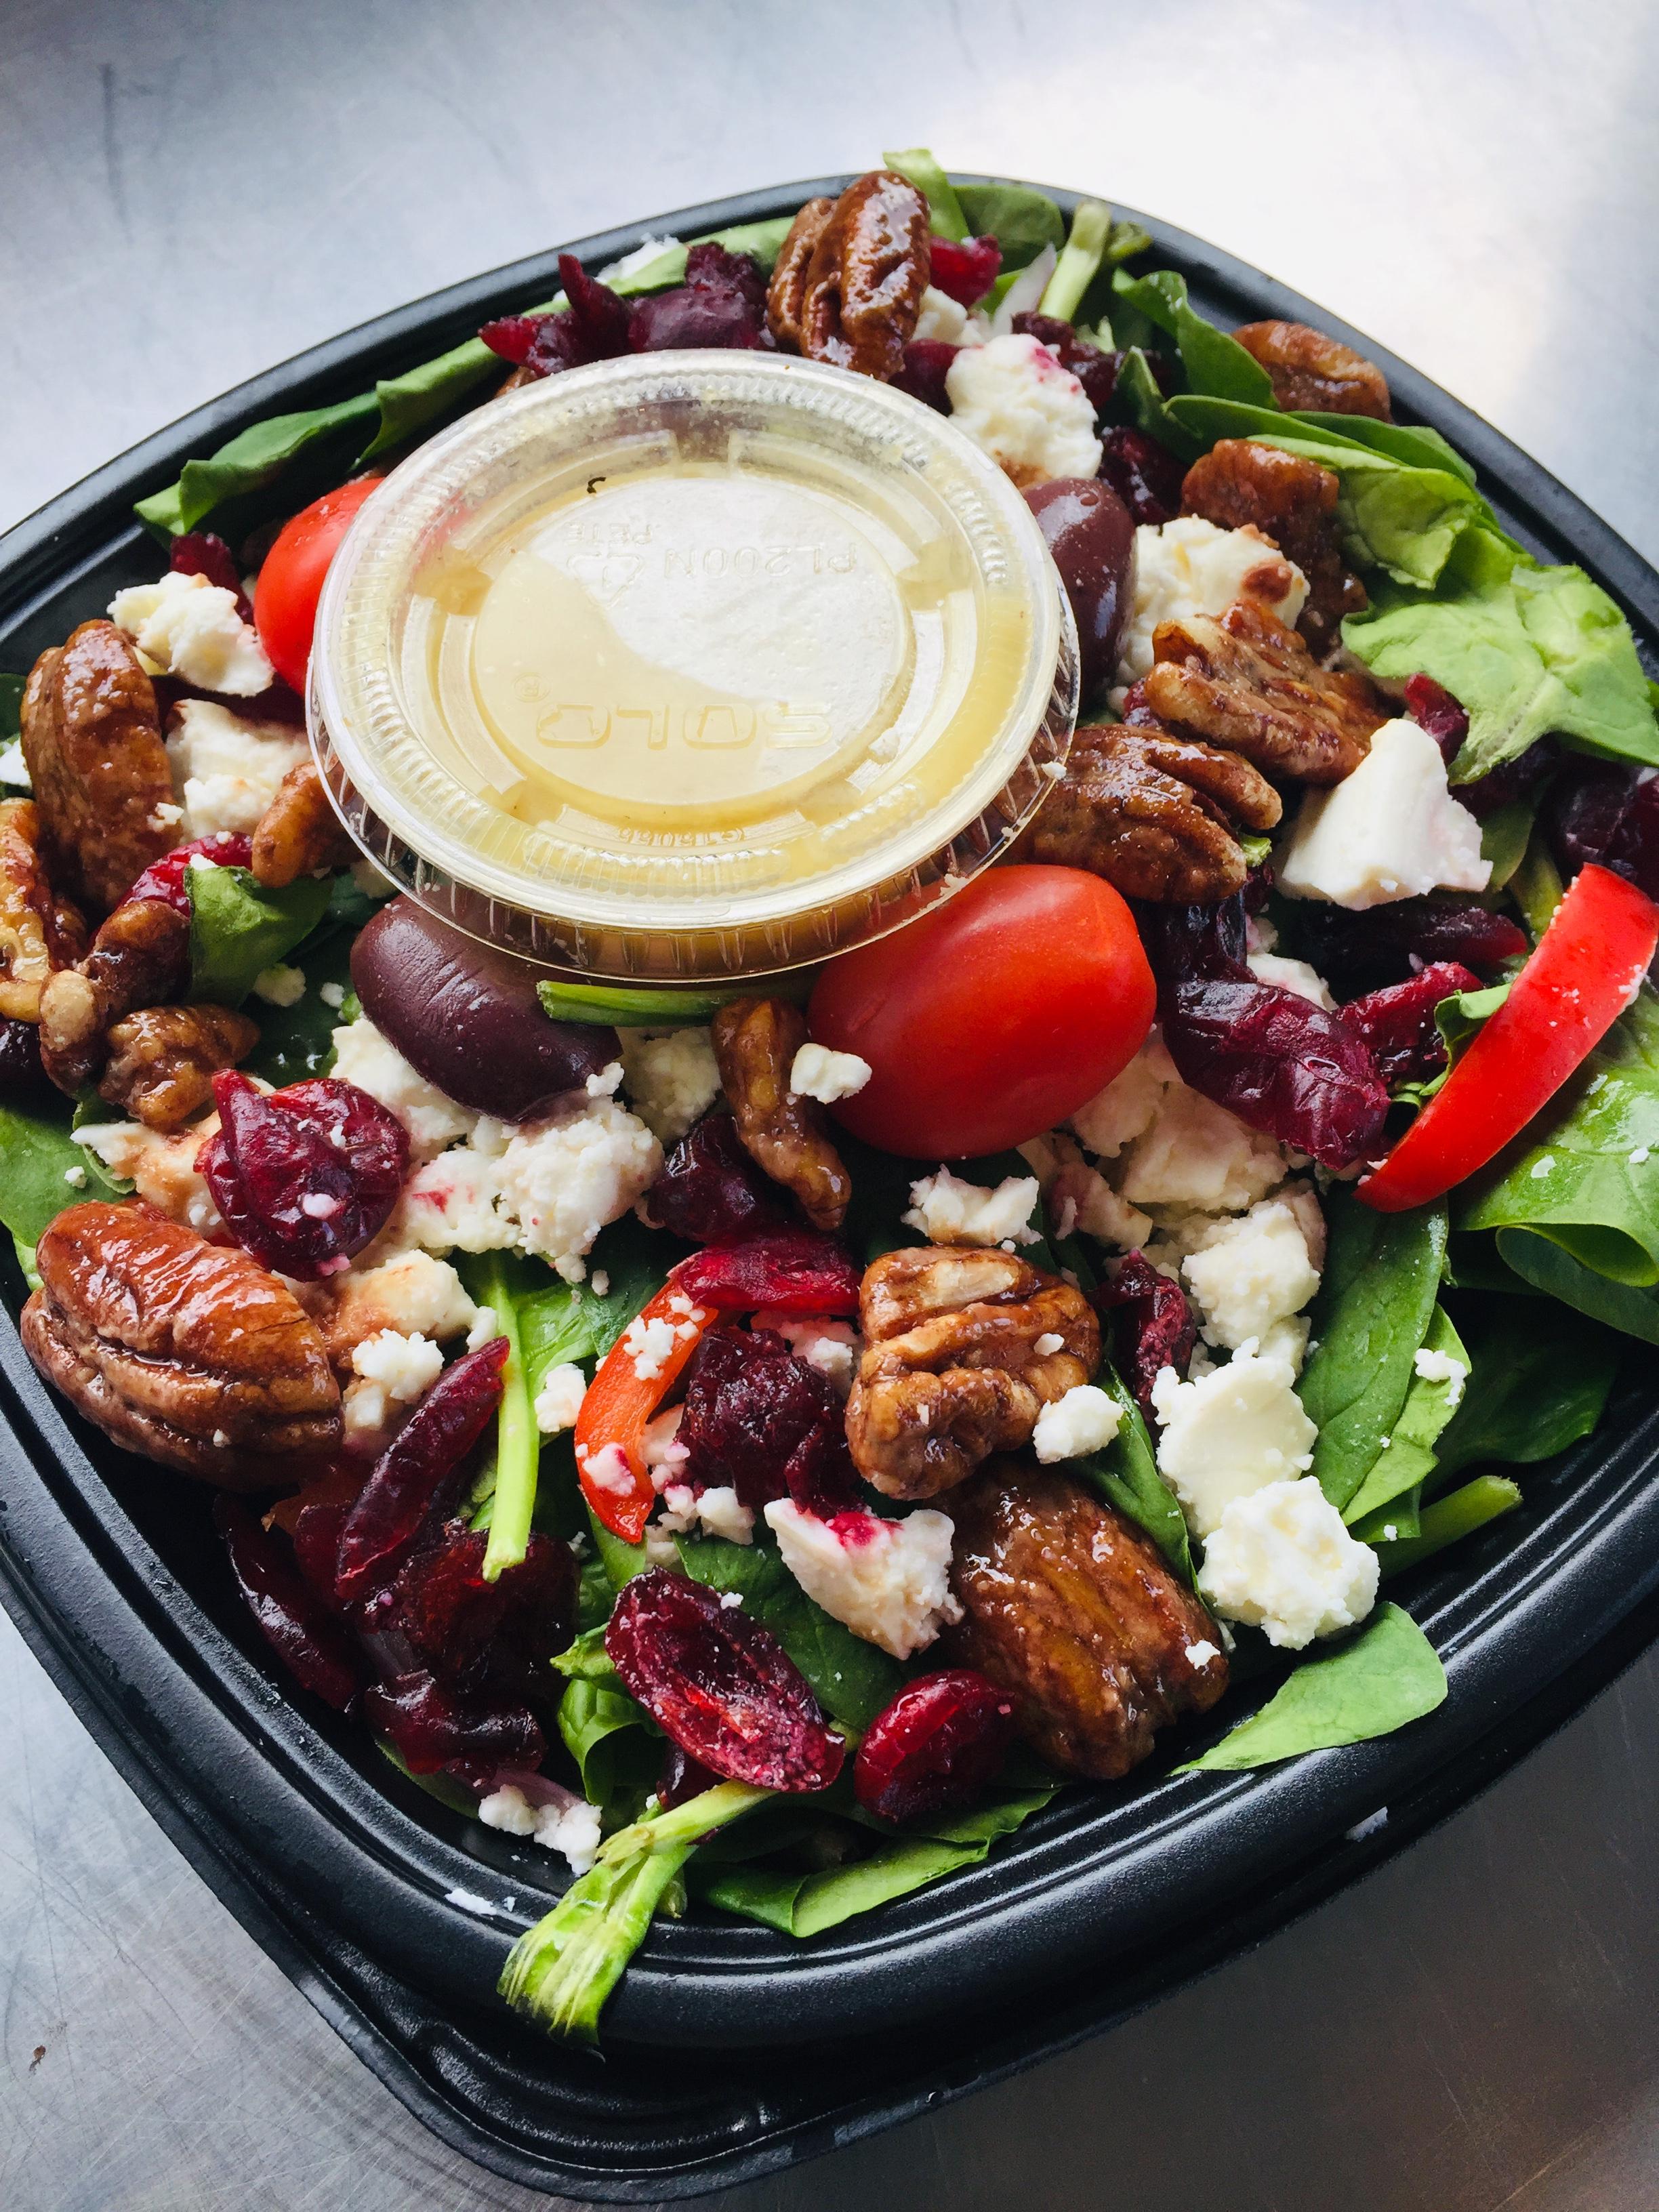 Spinach & Feta Salad:  (Sugared Pecans and Fig Vinaigrette)